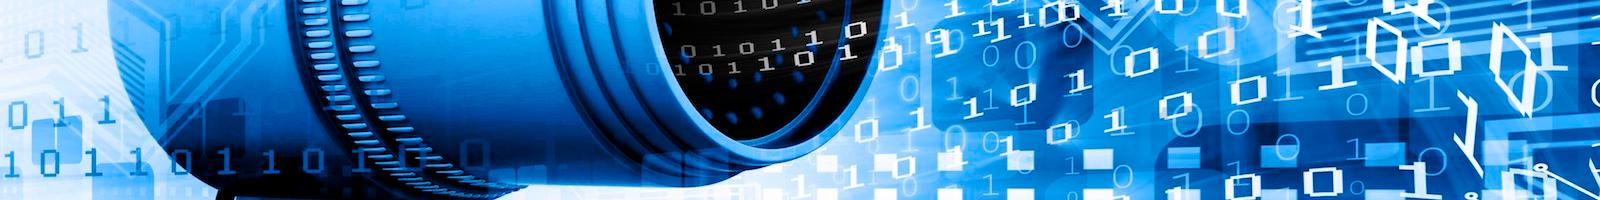 Smart surveillance application fragmentation: A PrEstoCloud oriented approach